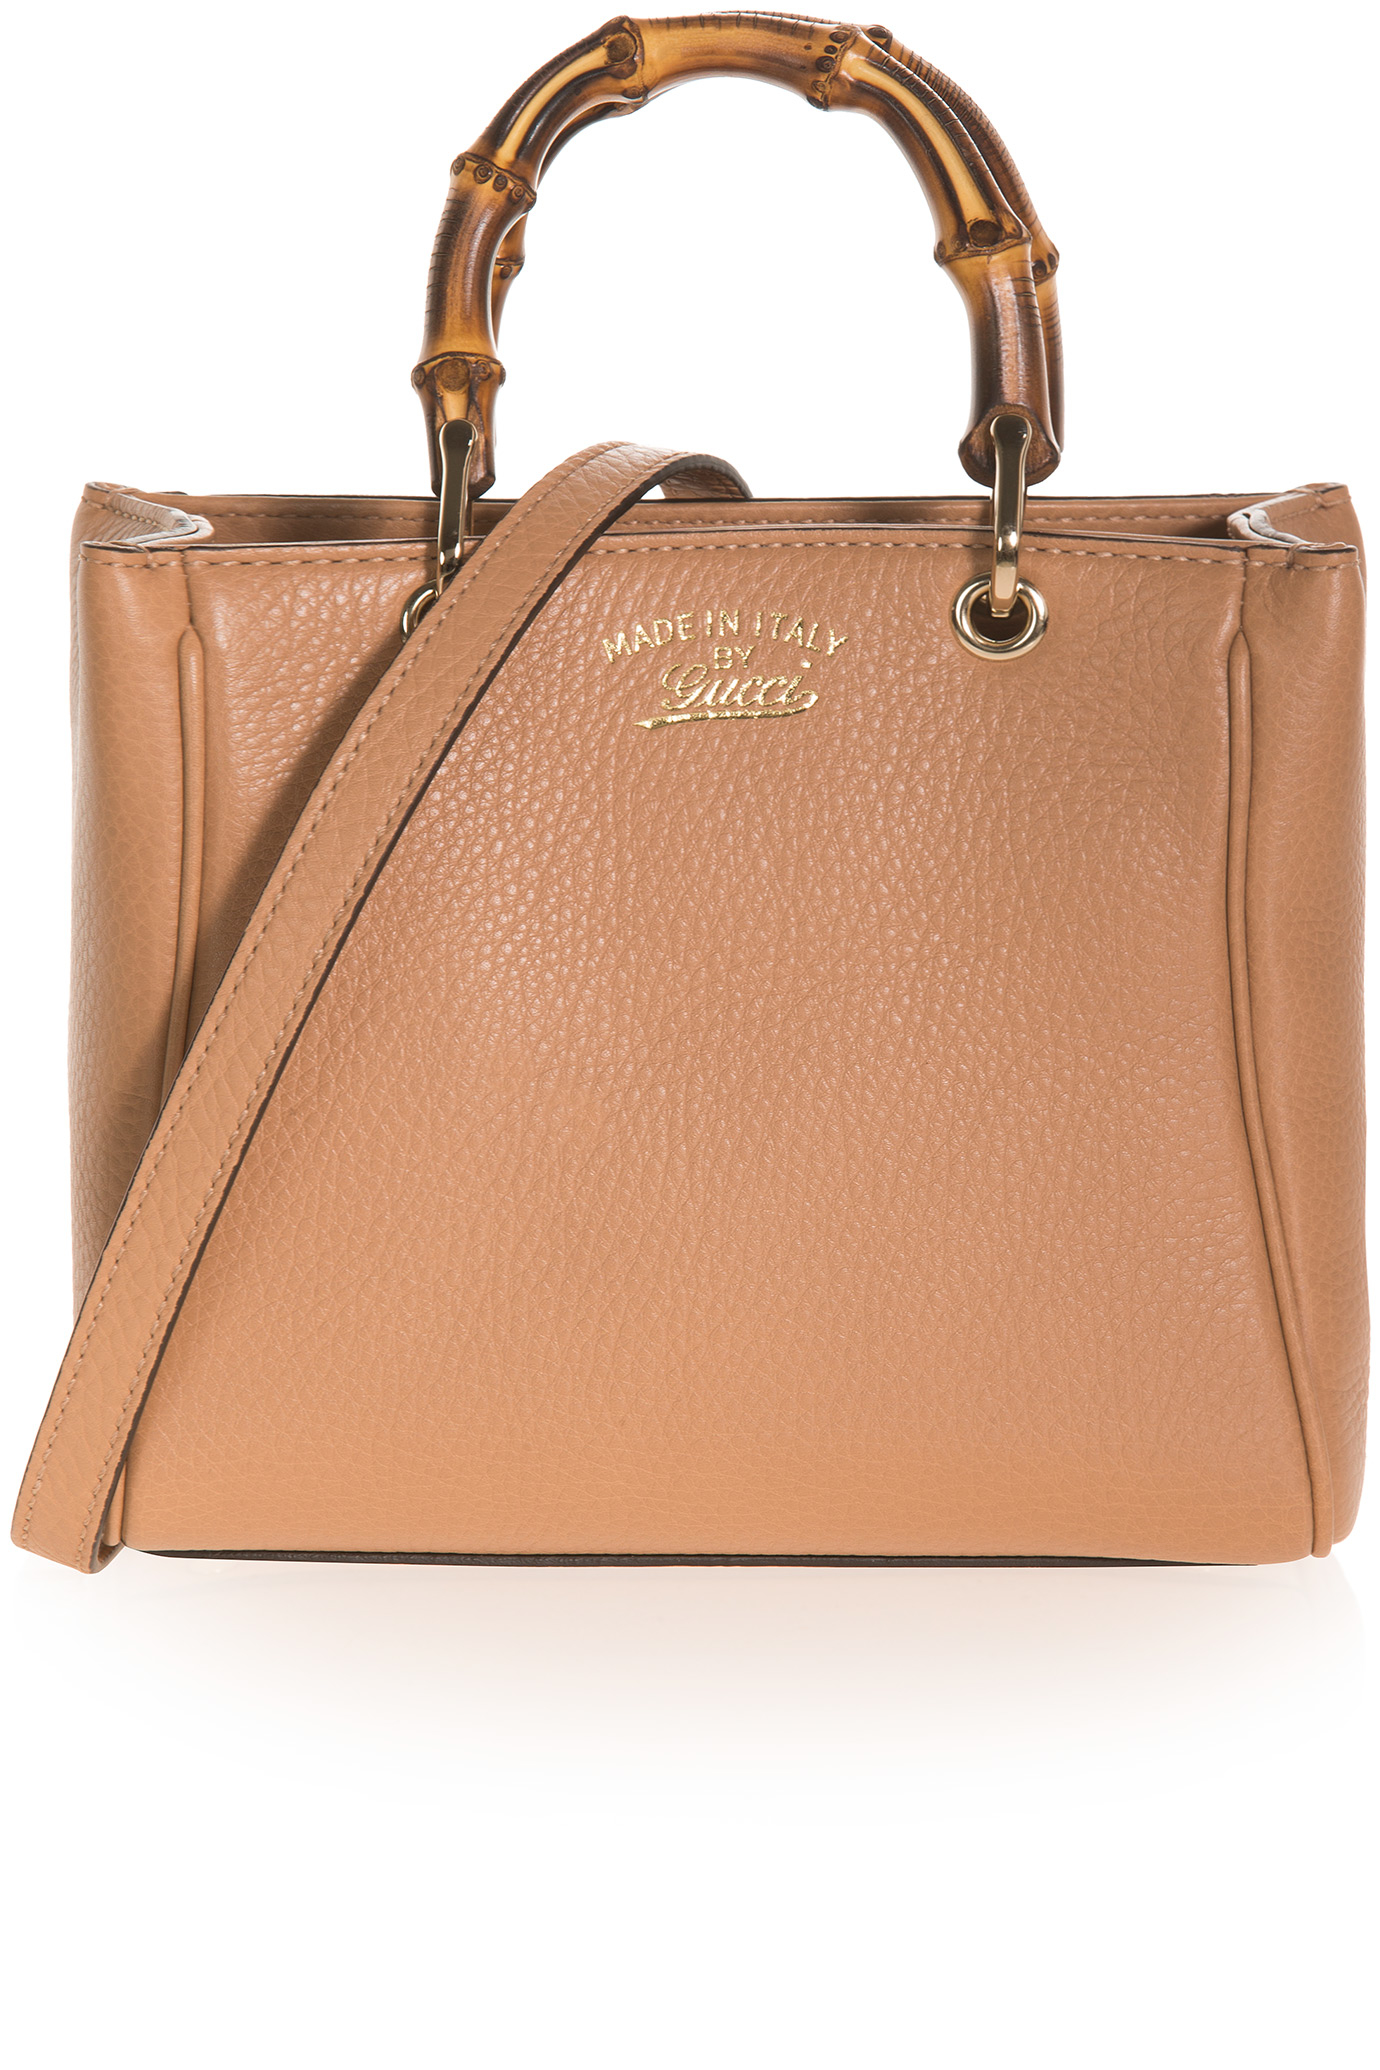 Gucci Mini Bamboo Shoulder Bag in Brown